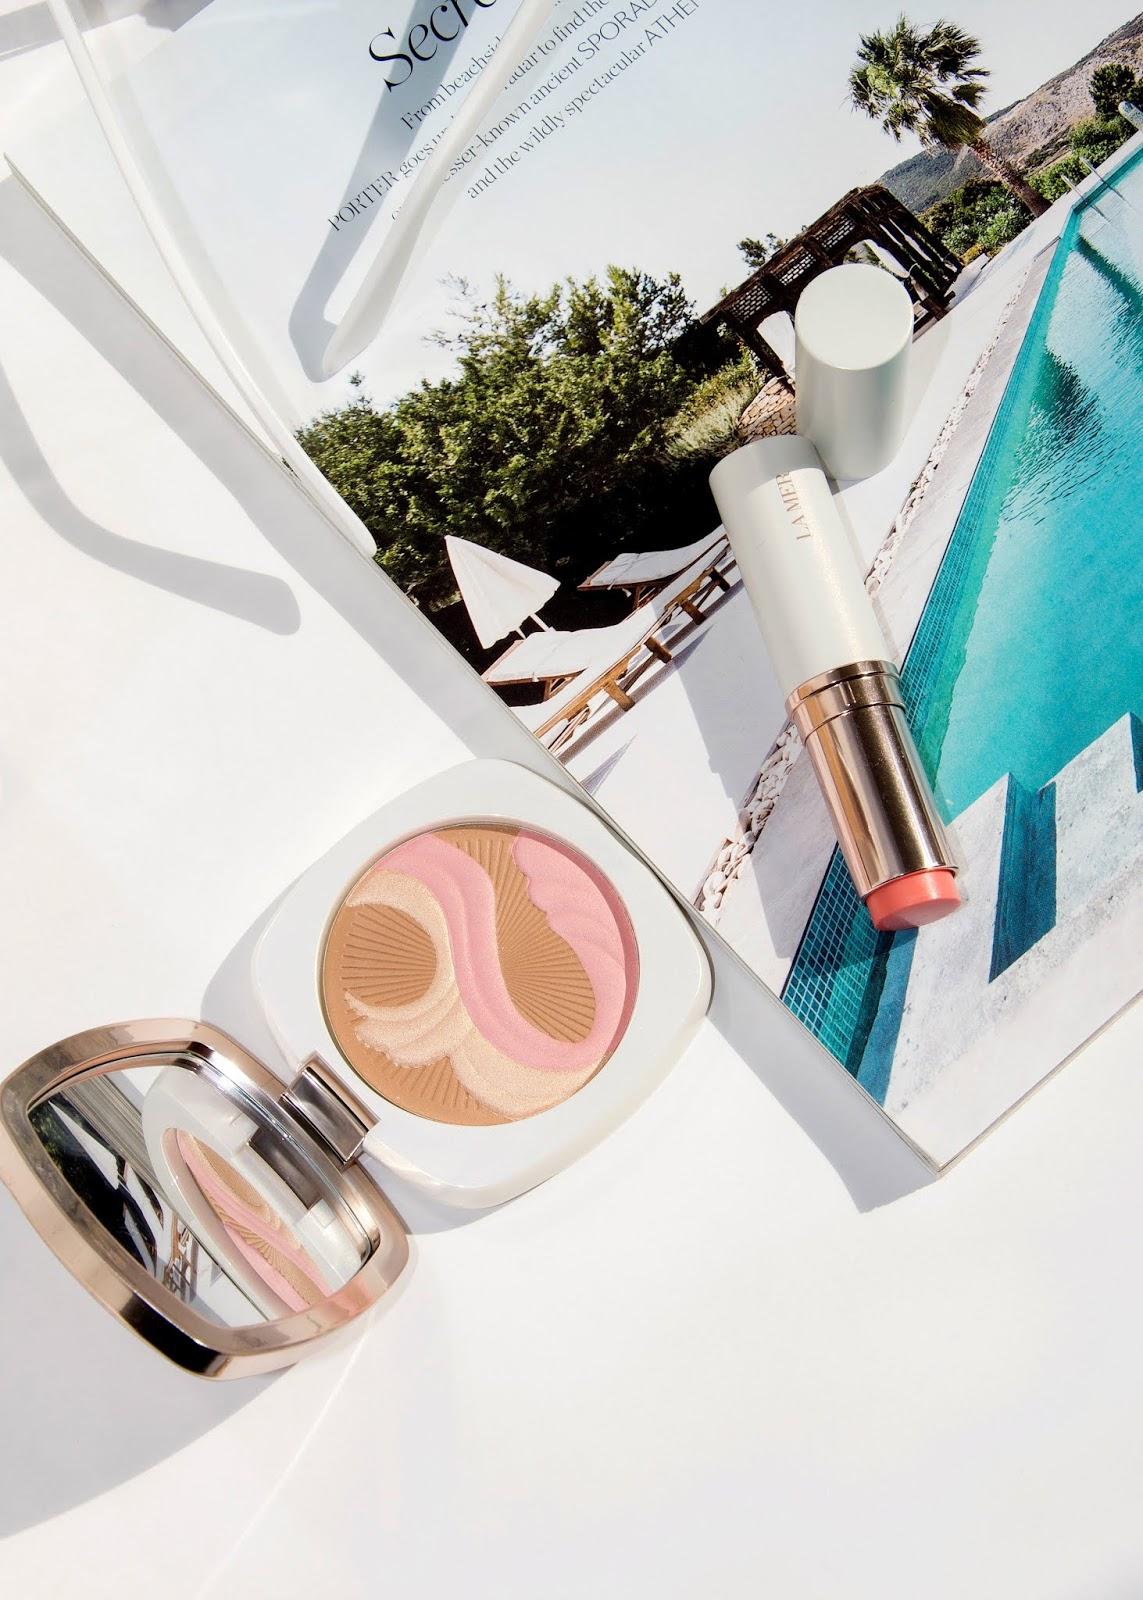 La Mer Soleil De La Mer 2018:The Bronzing Powder and  Lip & Cheek Glow